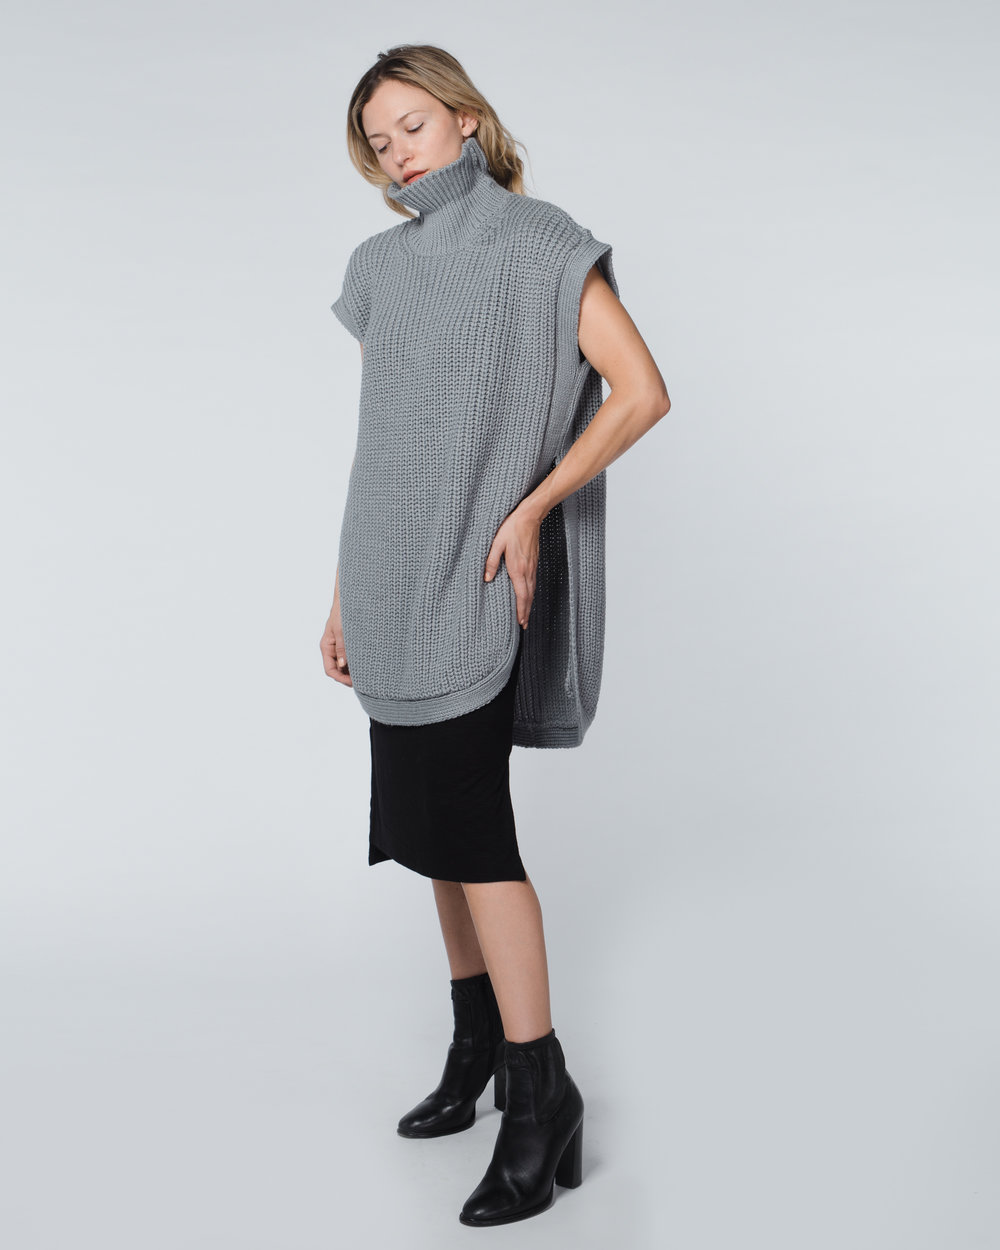 agoraphobia-collective-1x1-sleeveless-turtleneck-sweater-sharkskin-gray